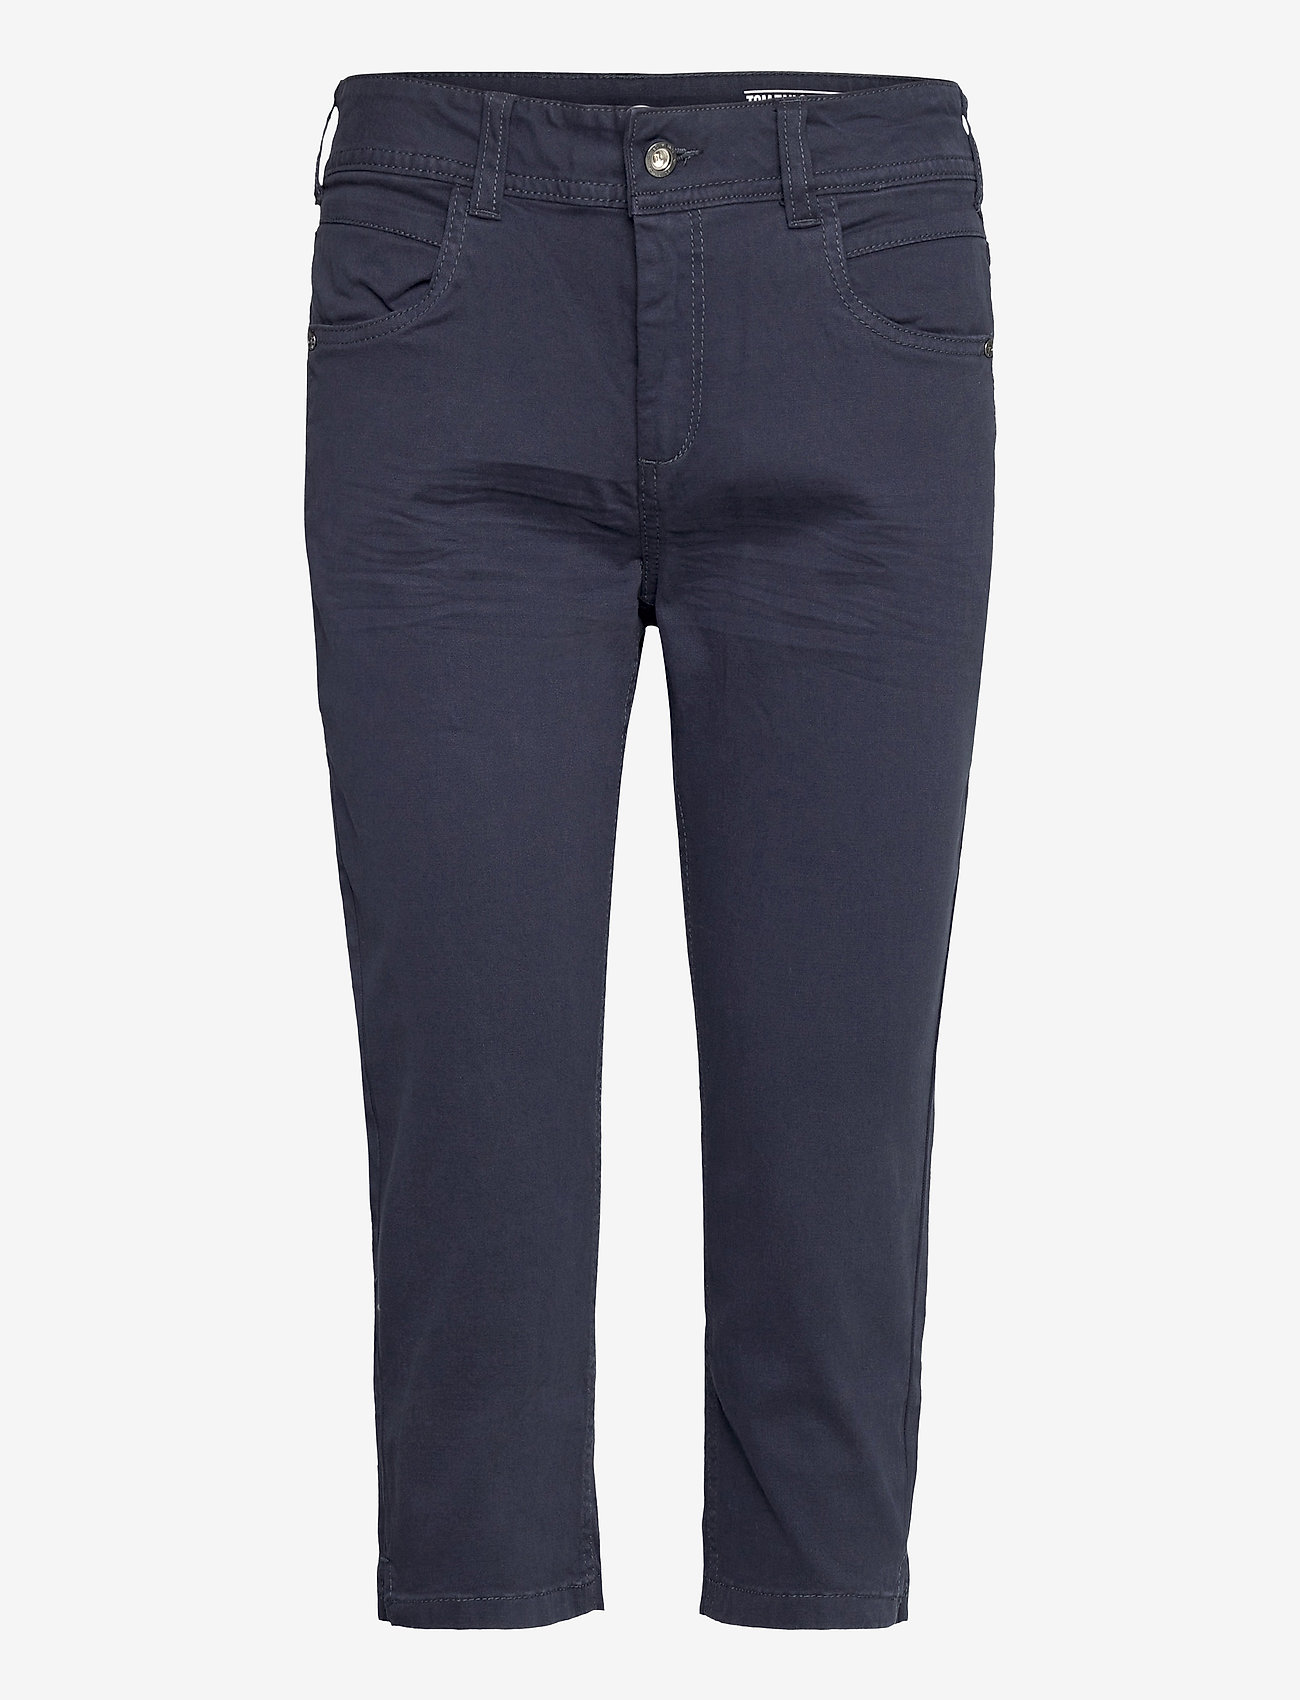 Tom Tailor - Tom Tailor K - pantalons capri - sky captain blue - 0